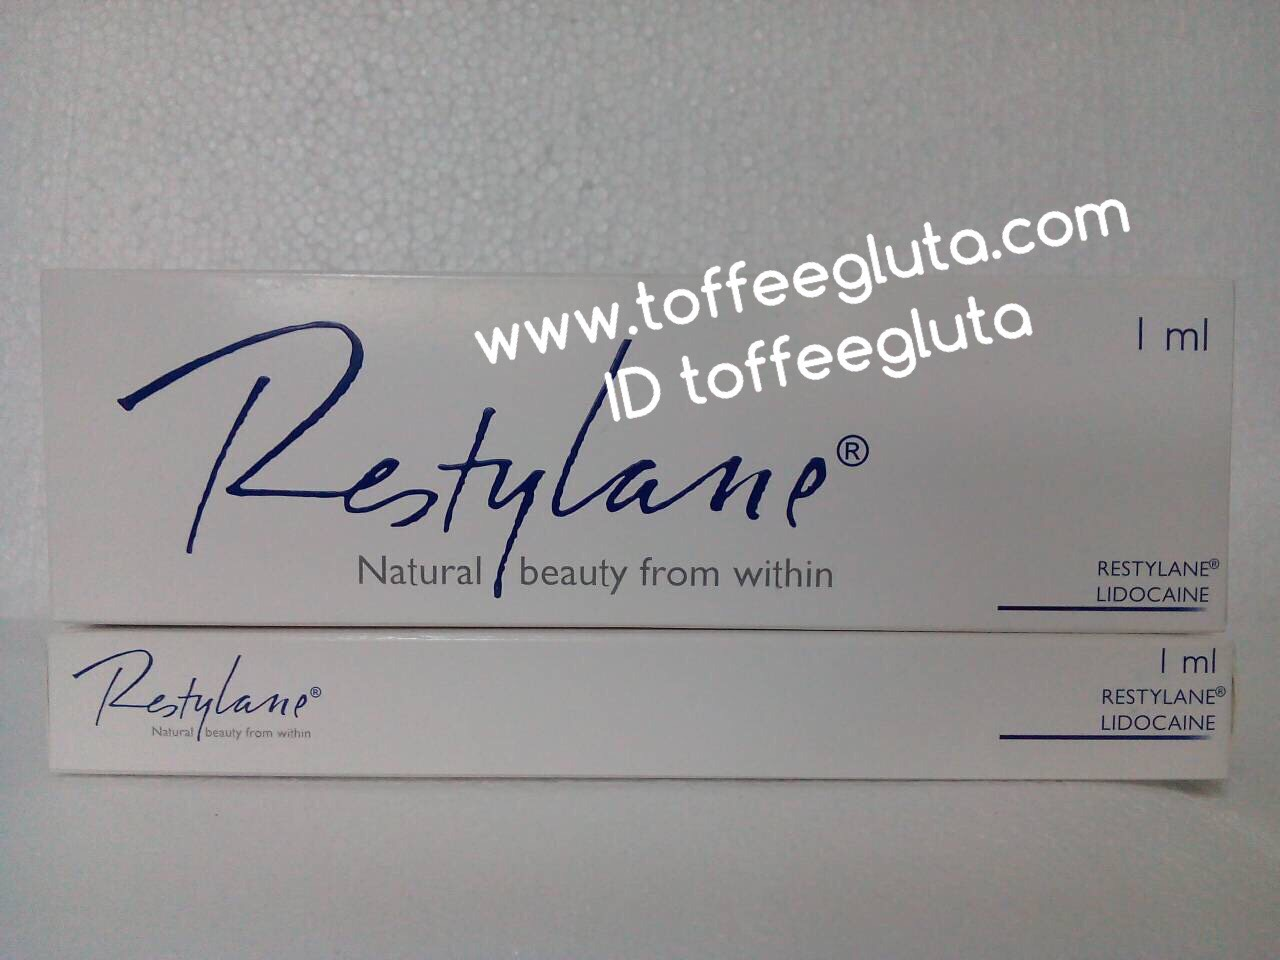 restylane / Perlane lidocaine ( ผสมยาชา )